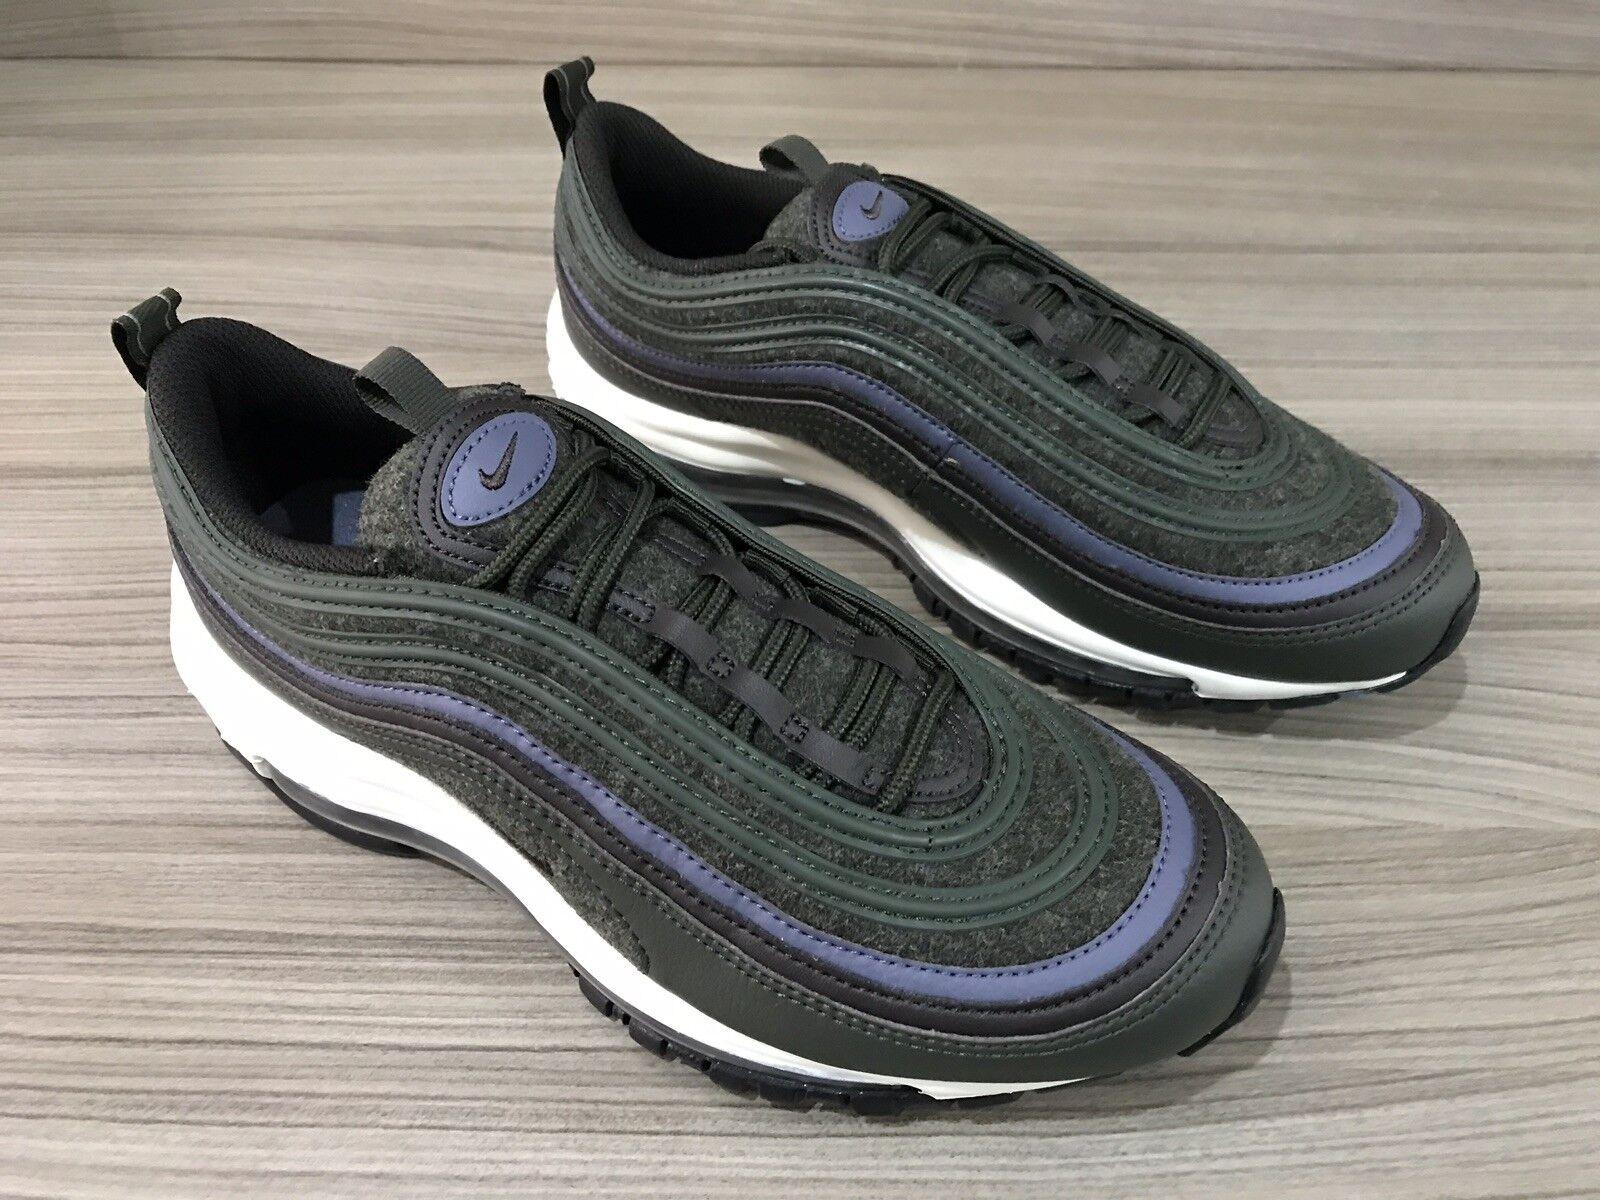 best sneakers 423df 99875 ... NIKE AIR MAX 97 PREMIUM Taille UK6/[312834 300] 300] 300] ...